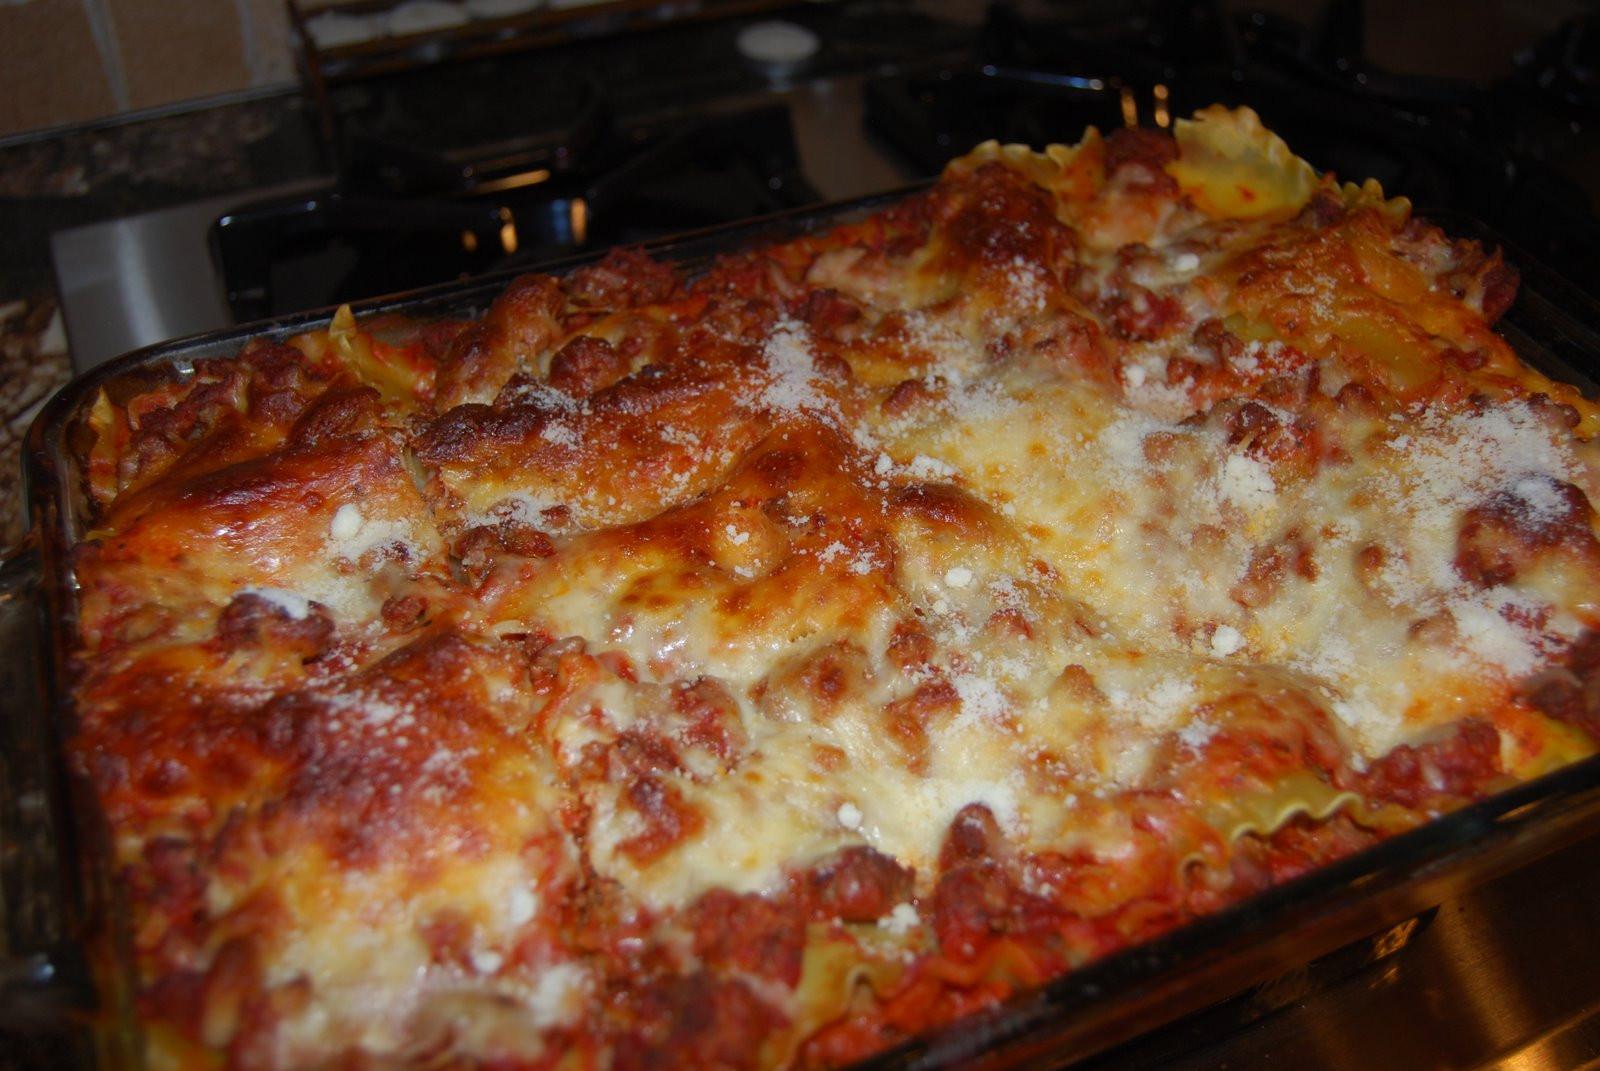 Italian Sausage Lasagna  Tasty Tidbits Thursdays Best Italian Sausage Lasagna and